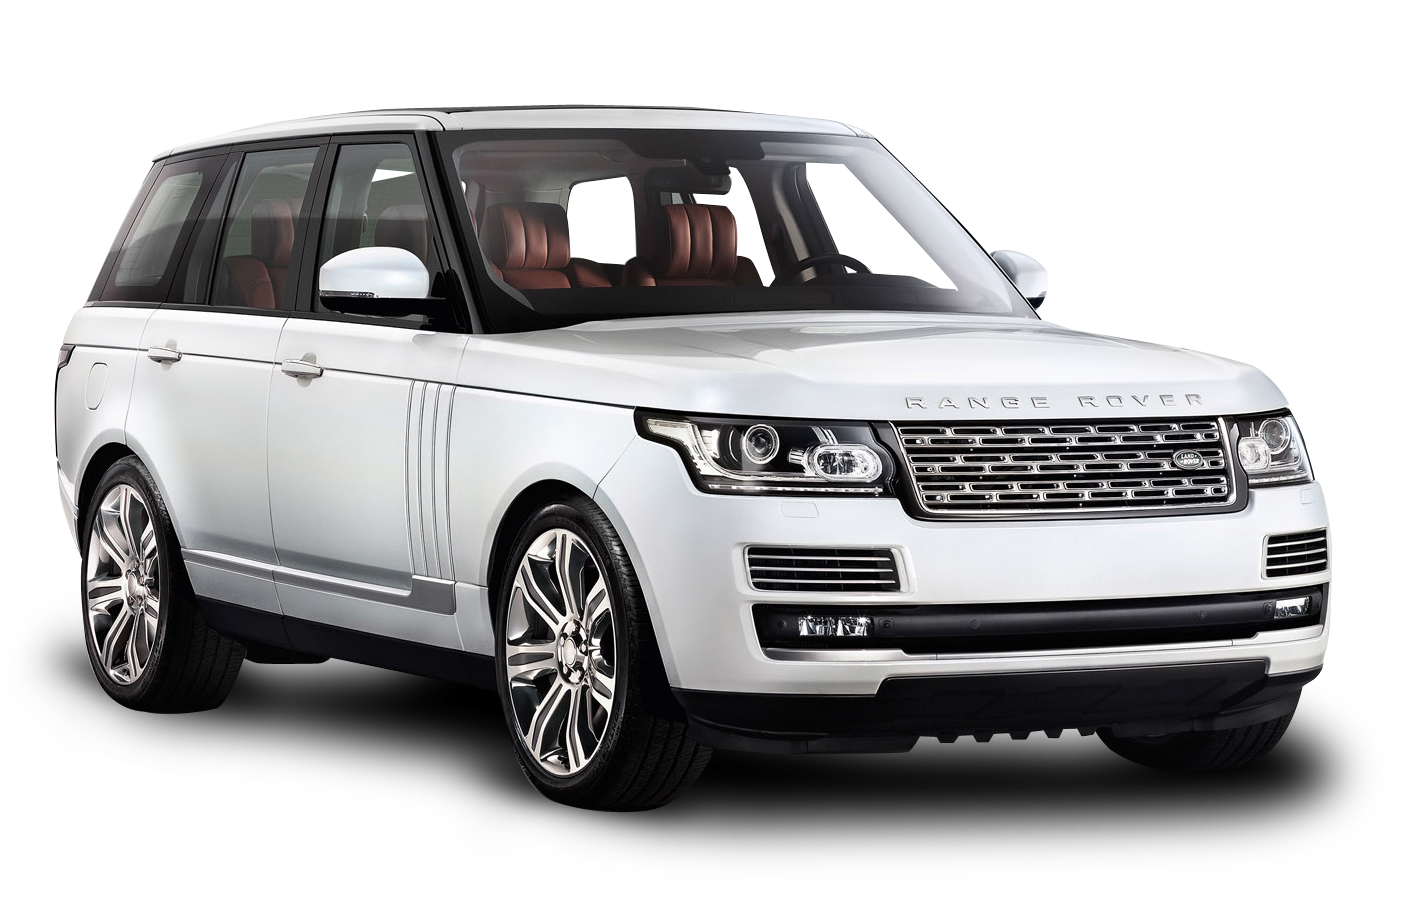 White Range Rover Car PNG Image